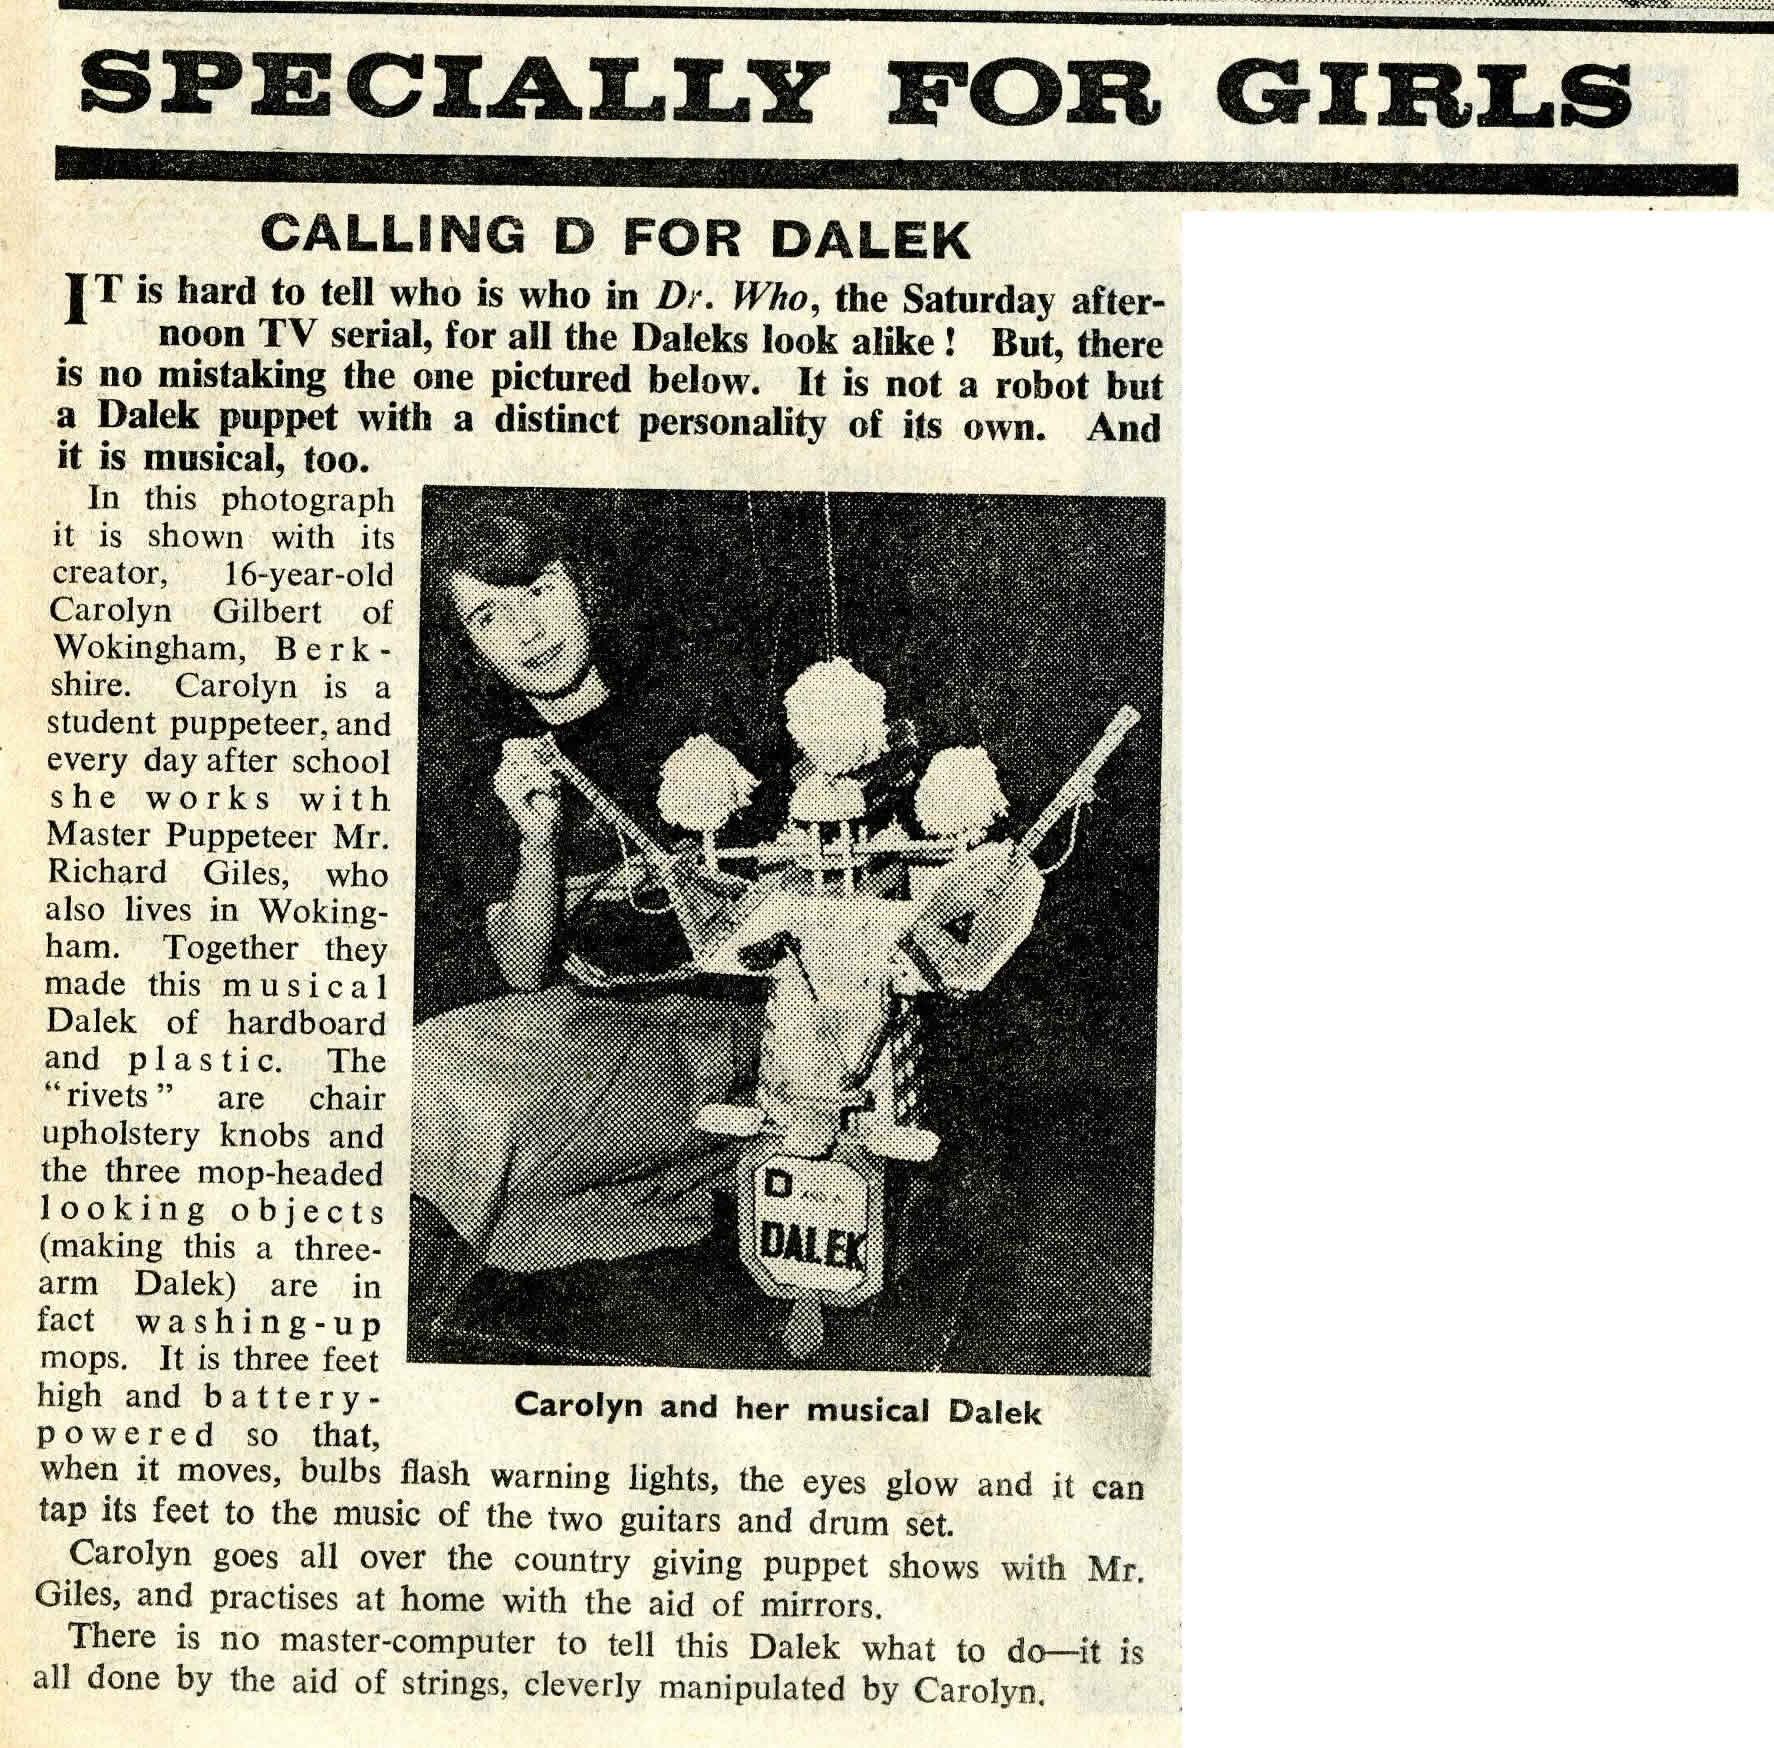 Arthur Mee's Children's Newspaper, January 30, 1965